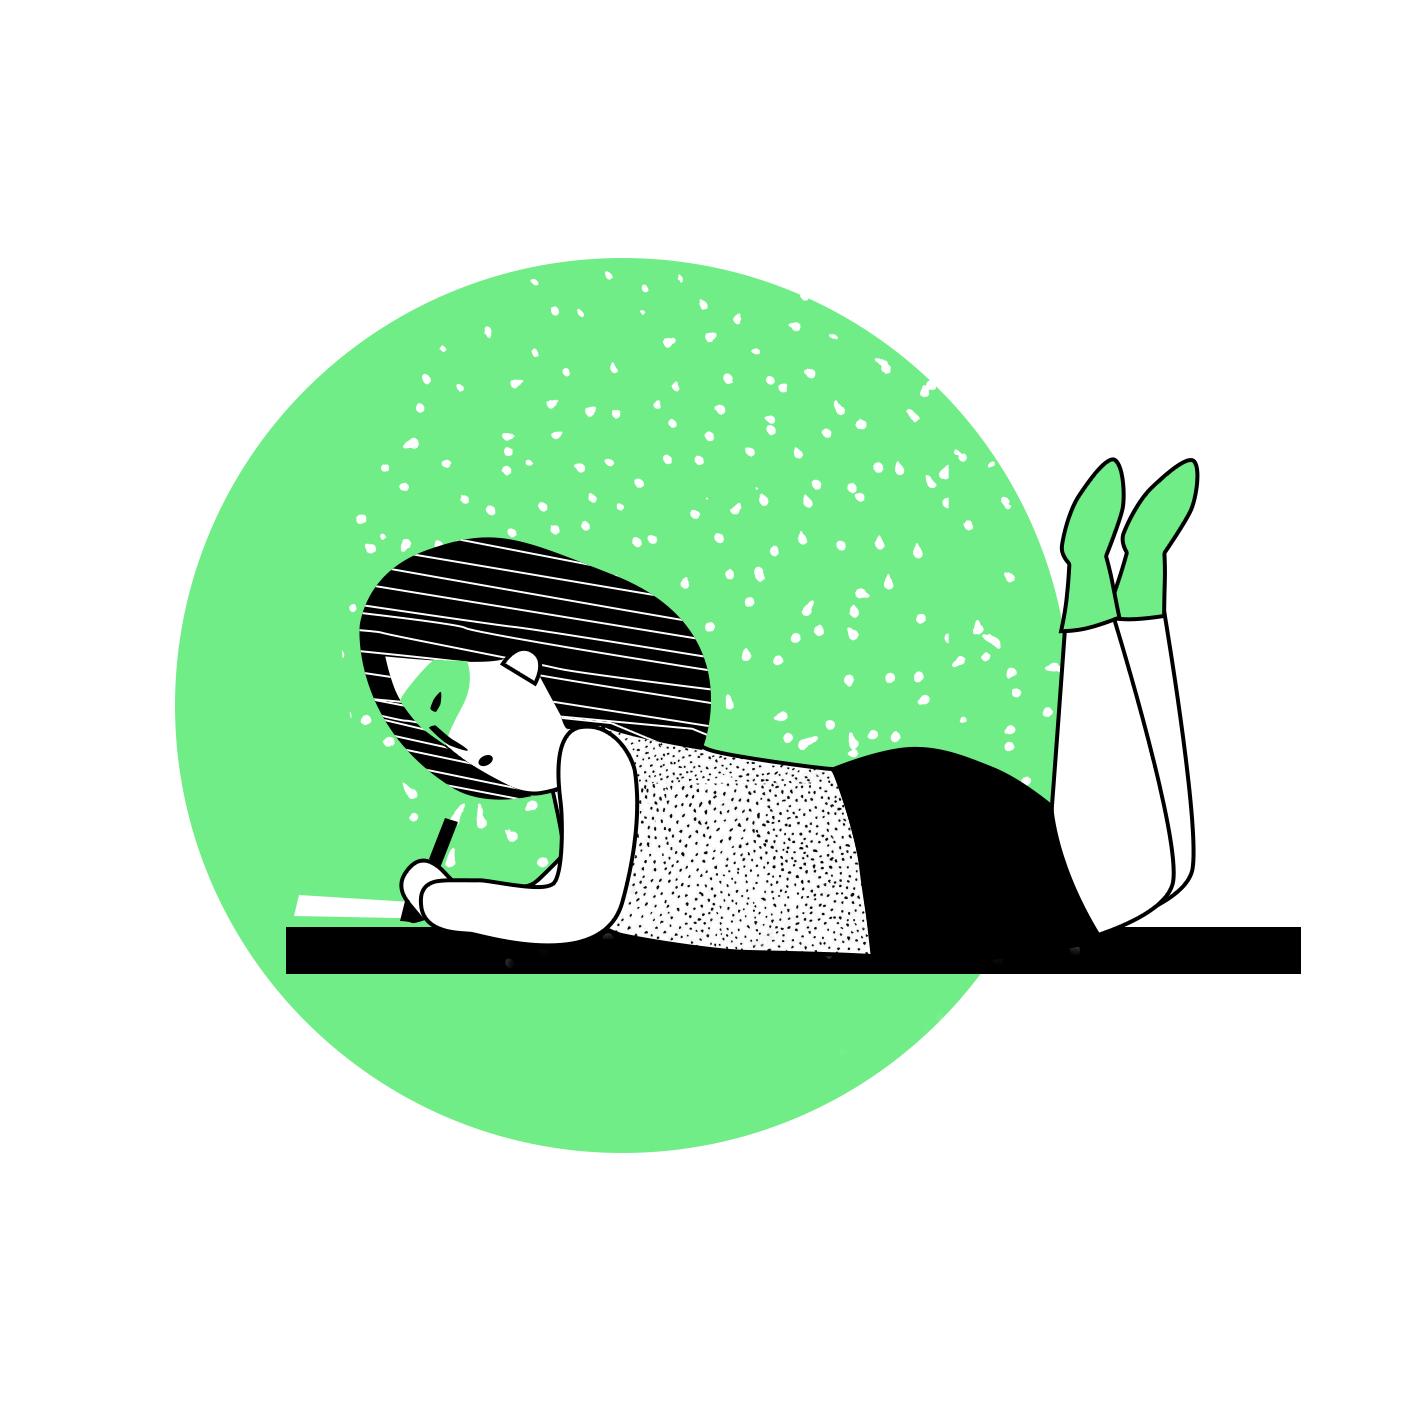 Graphiste illustrateur webdesigner pour Comette freelance en communication